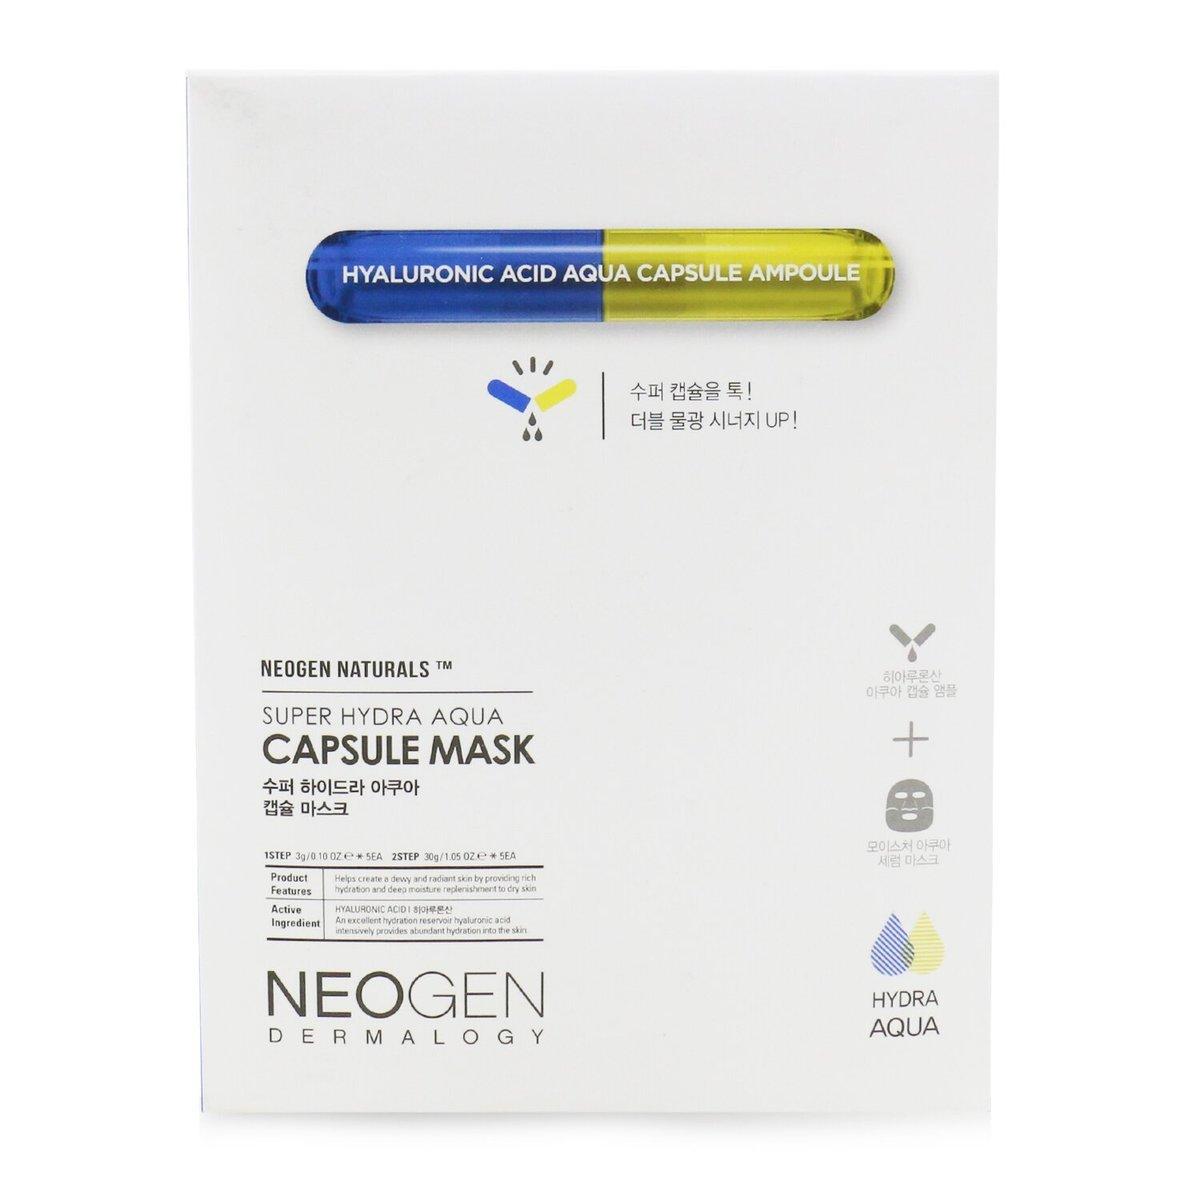 NEOGEN - Super Hydra Aqua Capsule Mask